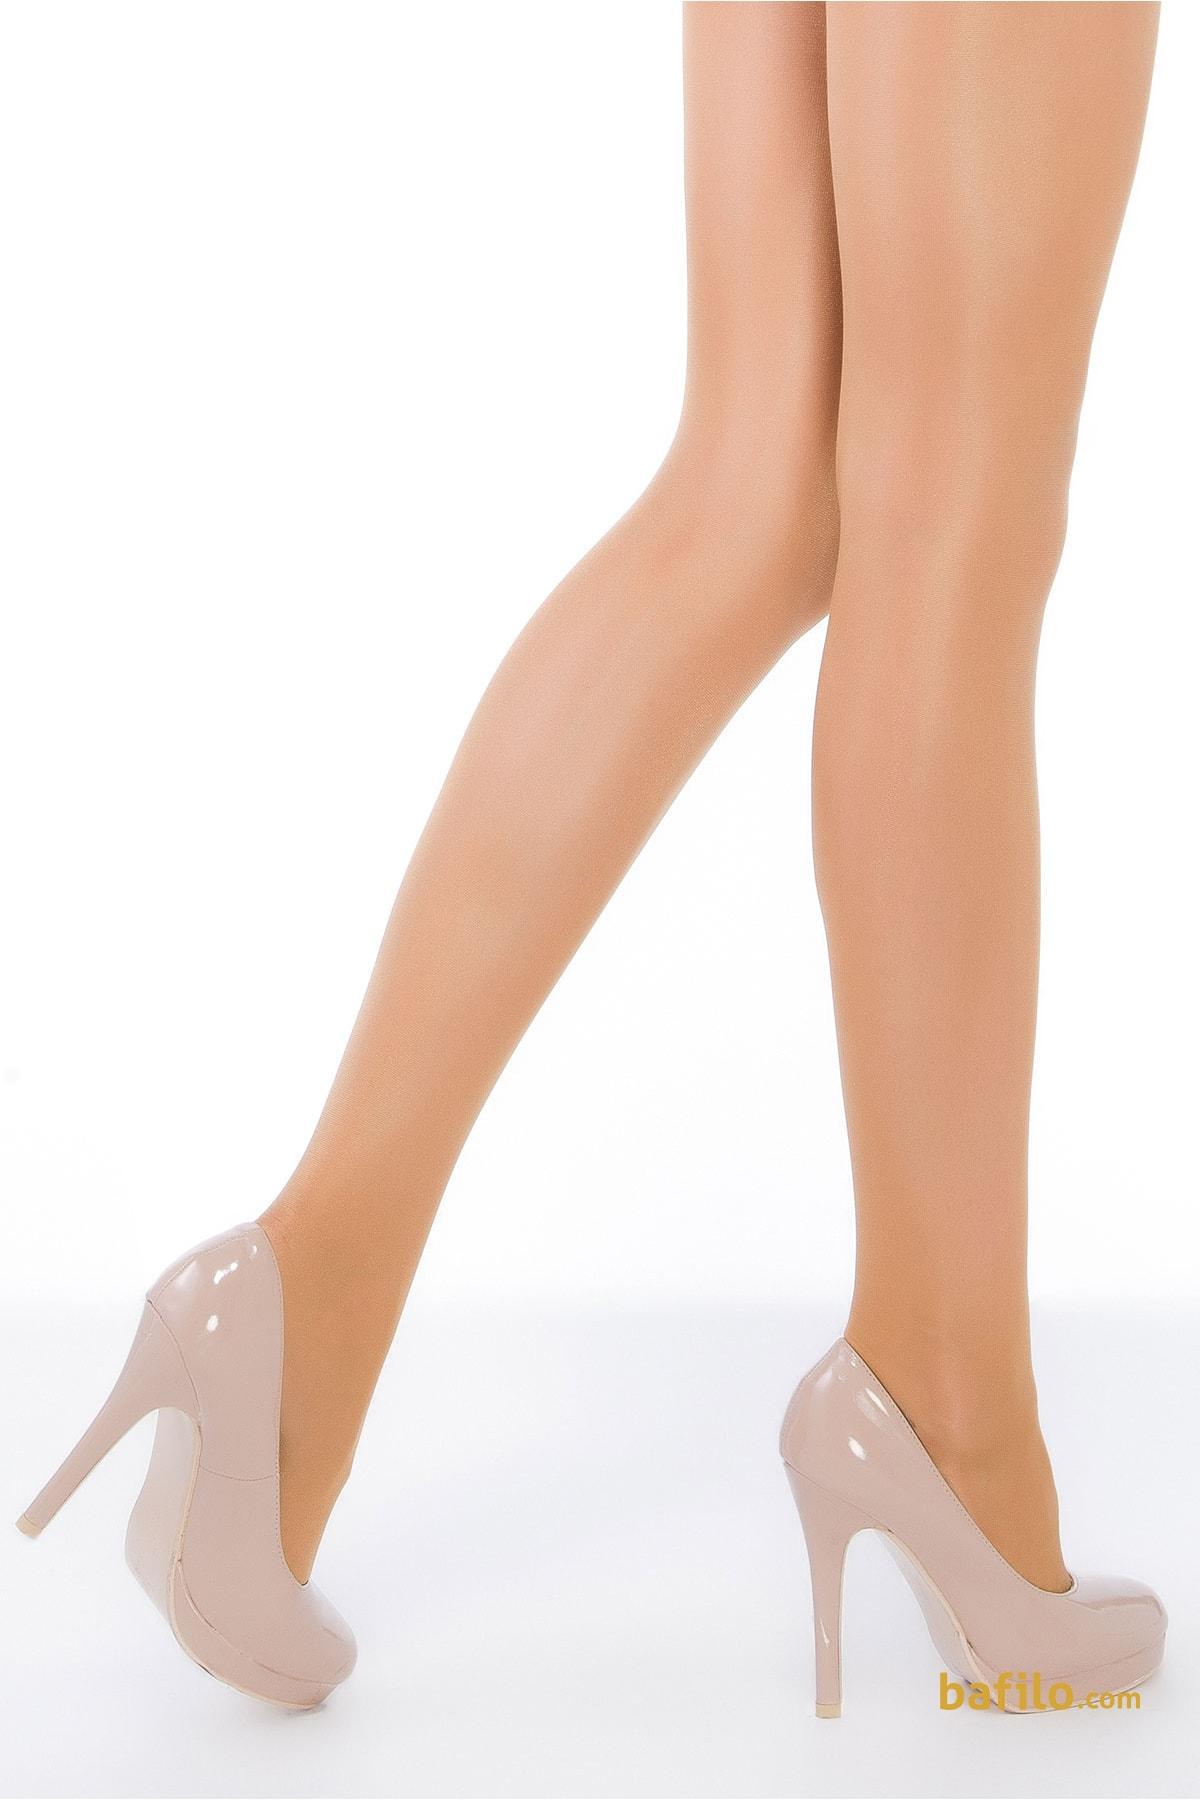 پنتی | Penti - جوراب شلواری زنانه پنتی Fit 20 - رنگ بدن روشن